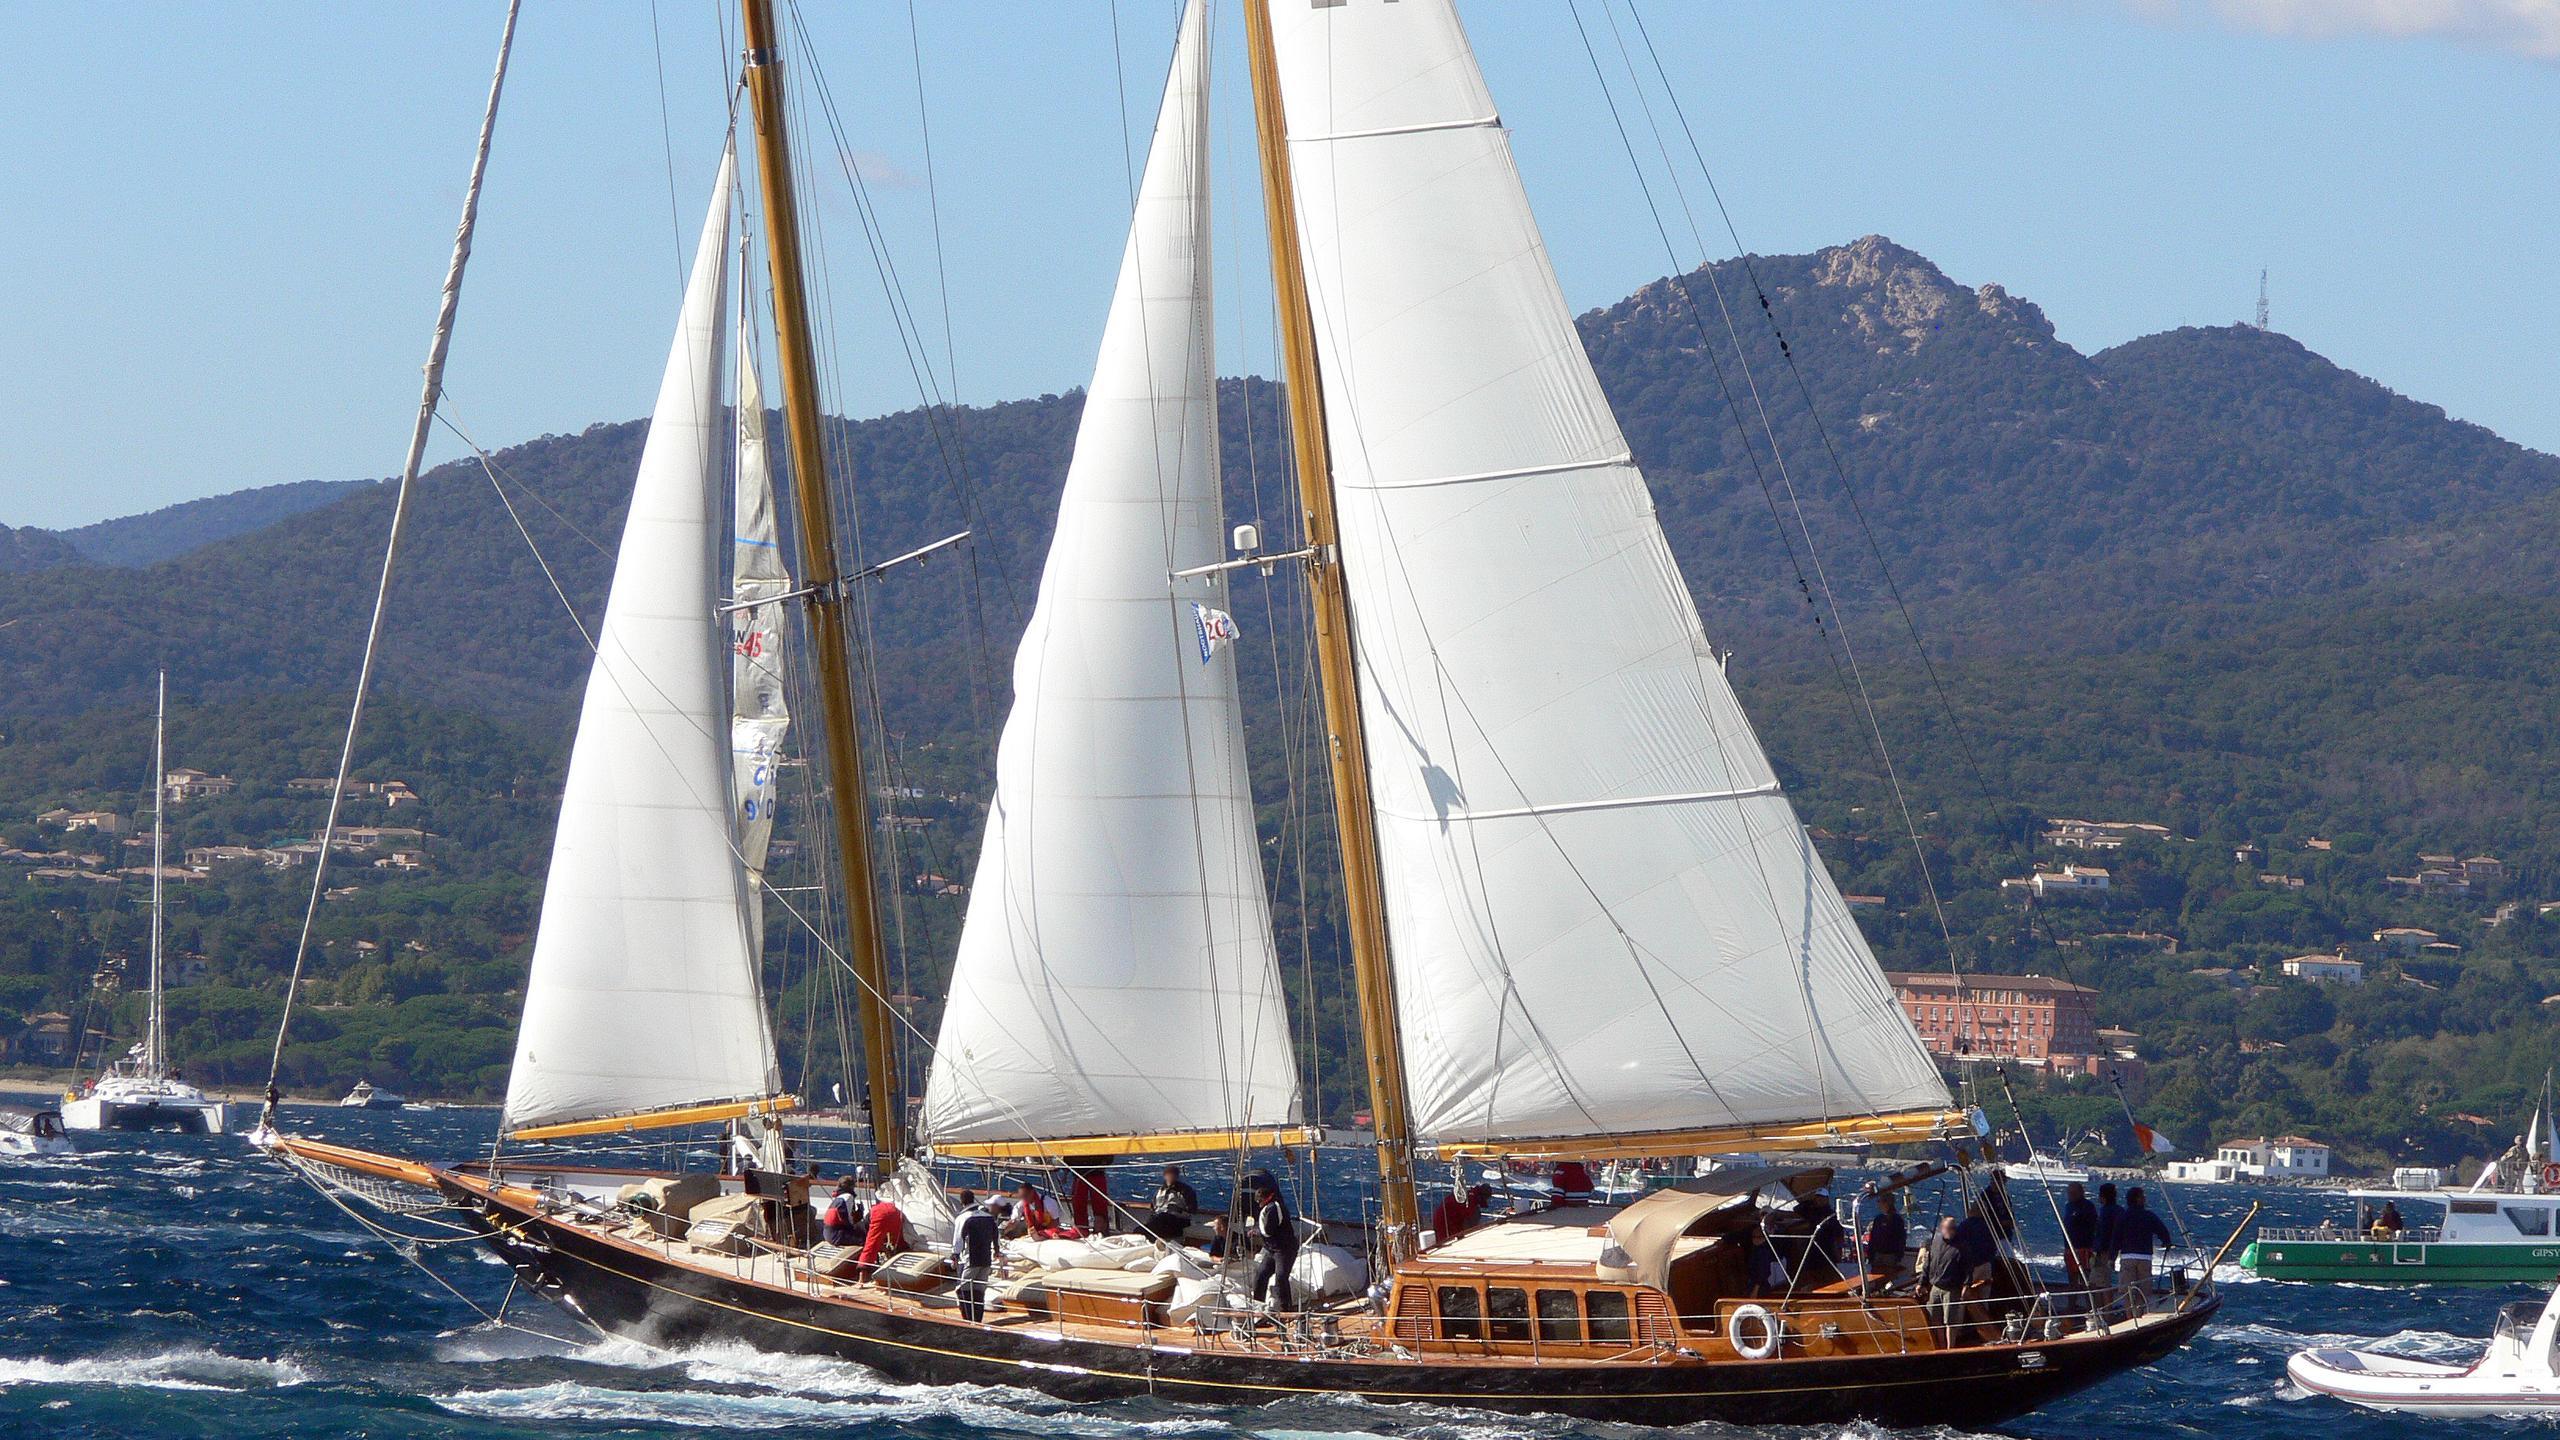 aschanti-iv-of-vegesack-yacht-exterior